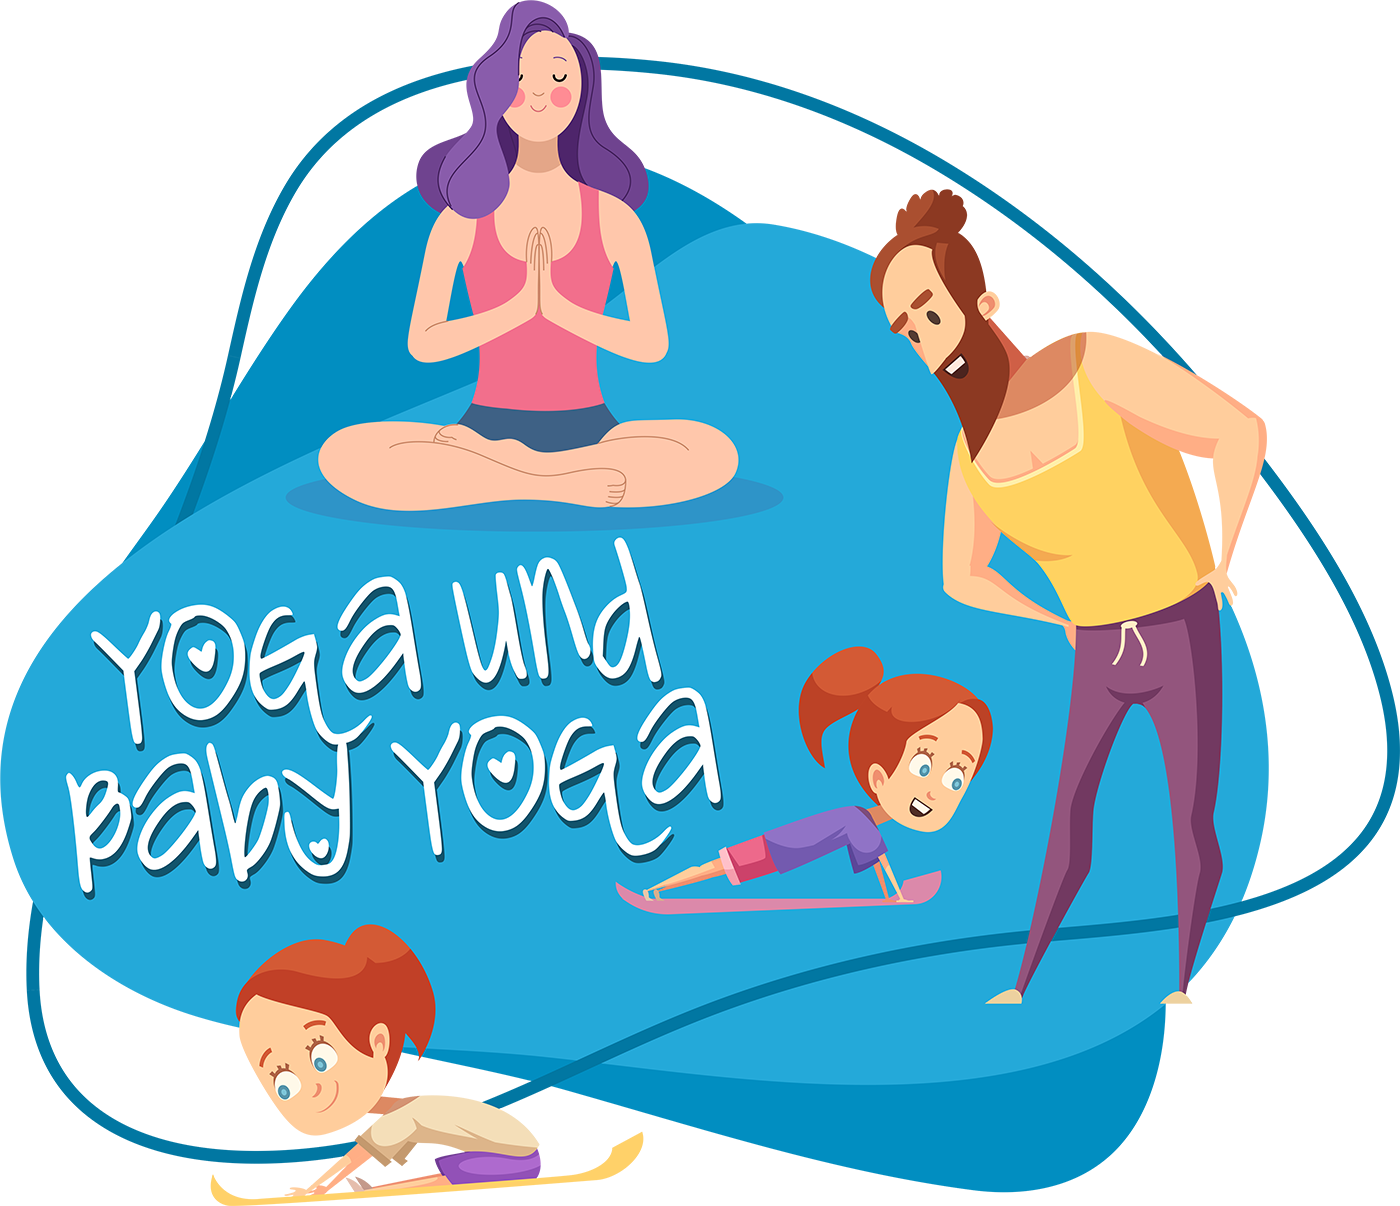 Yoga und Baby Yoga